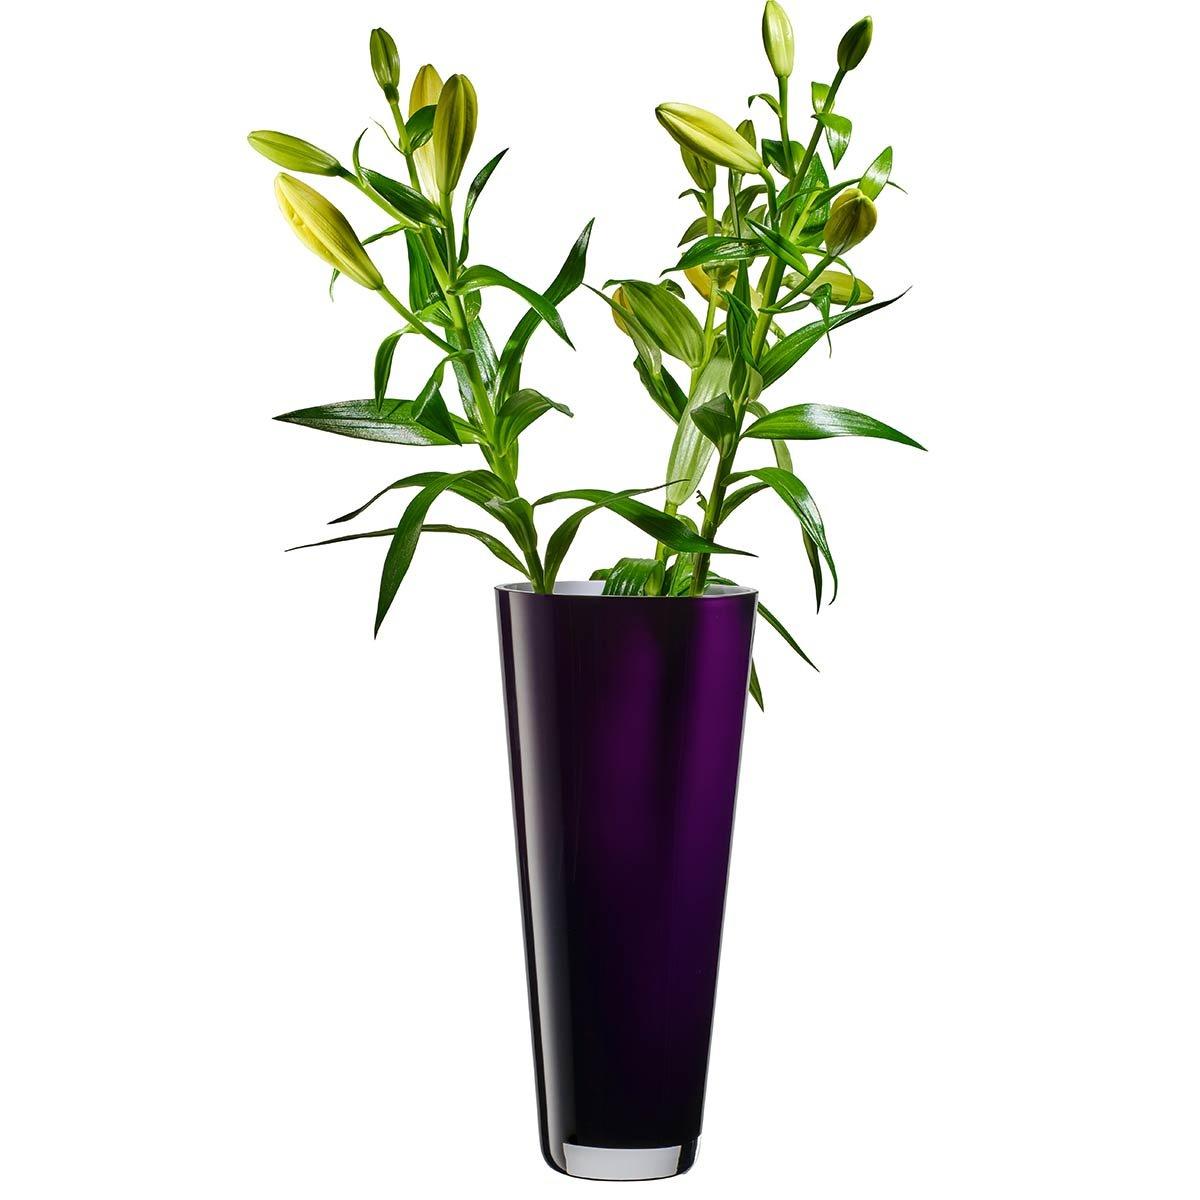 Villeroy & Boch Vase amazon